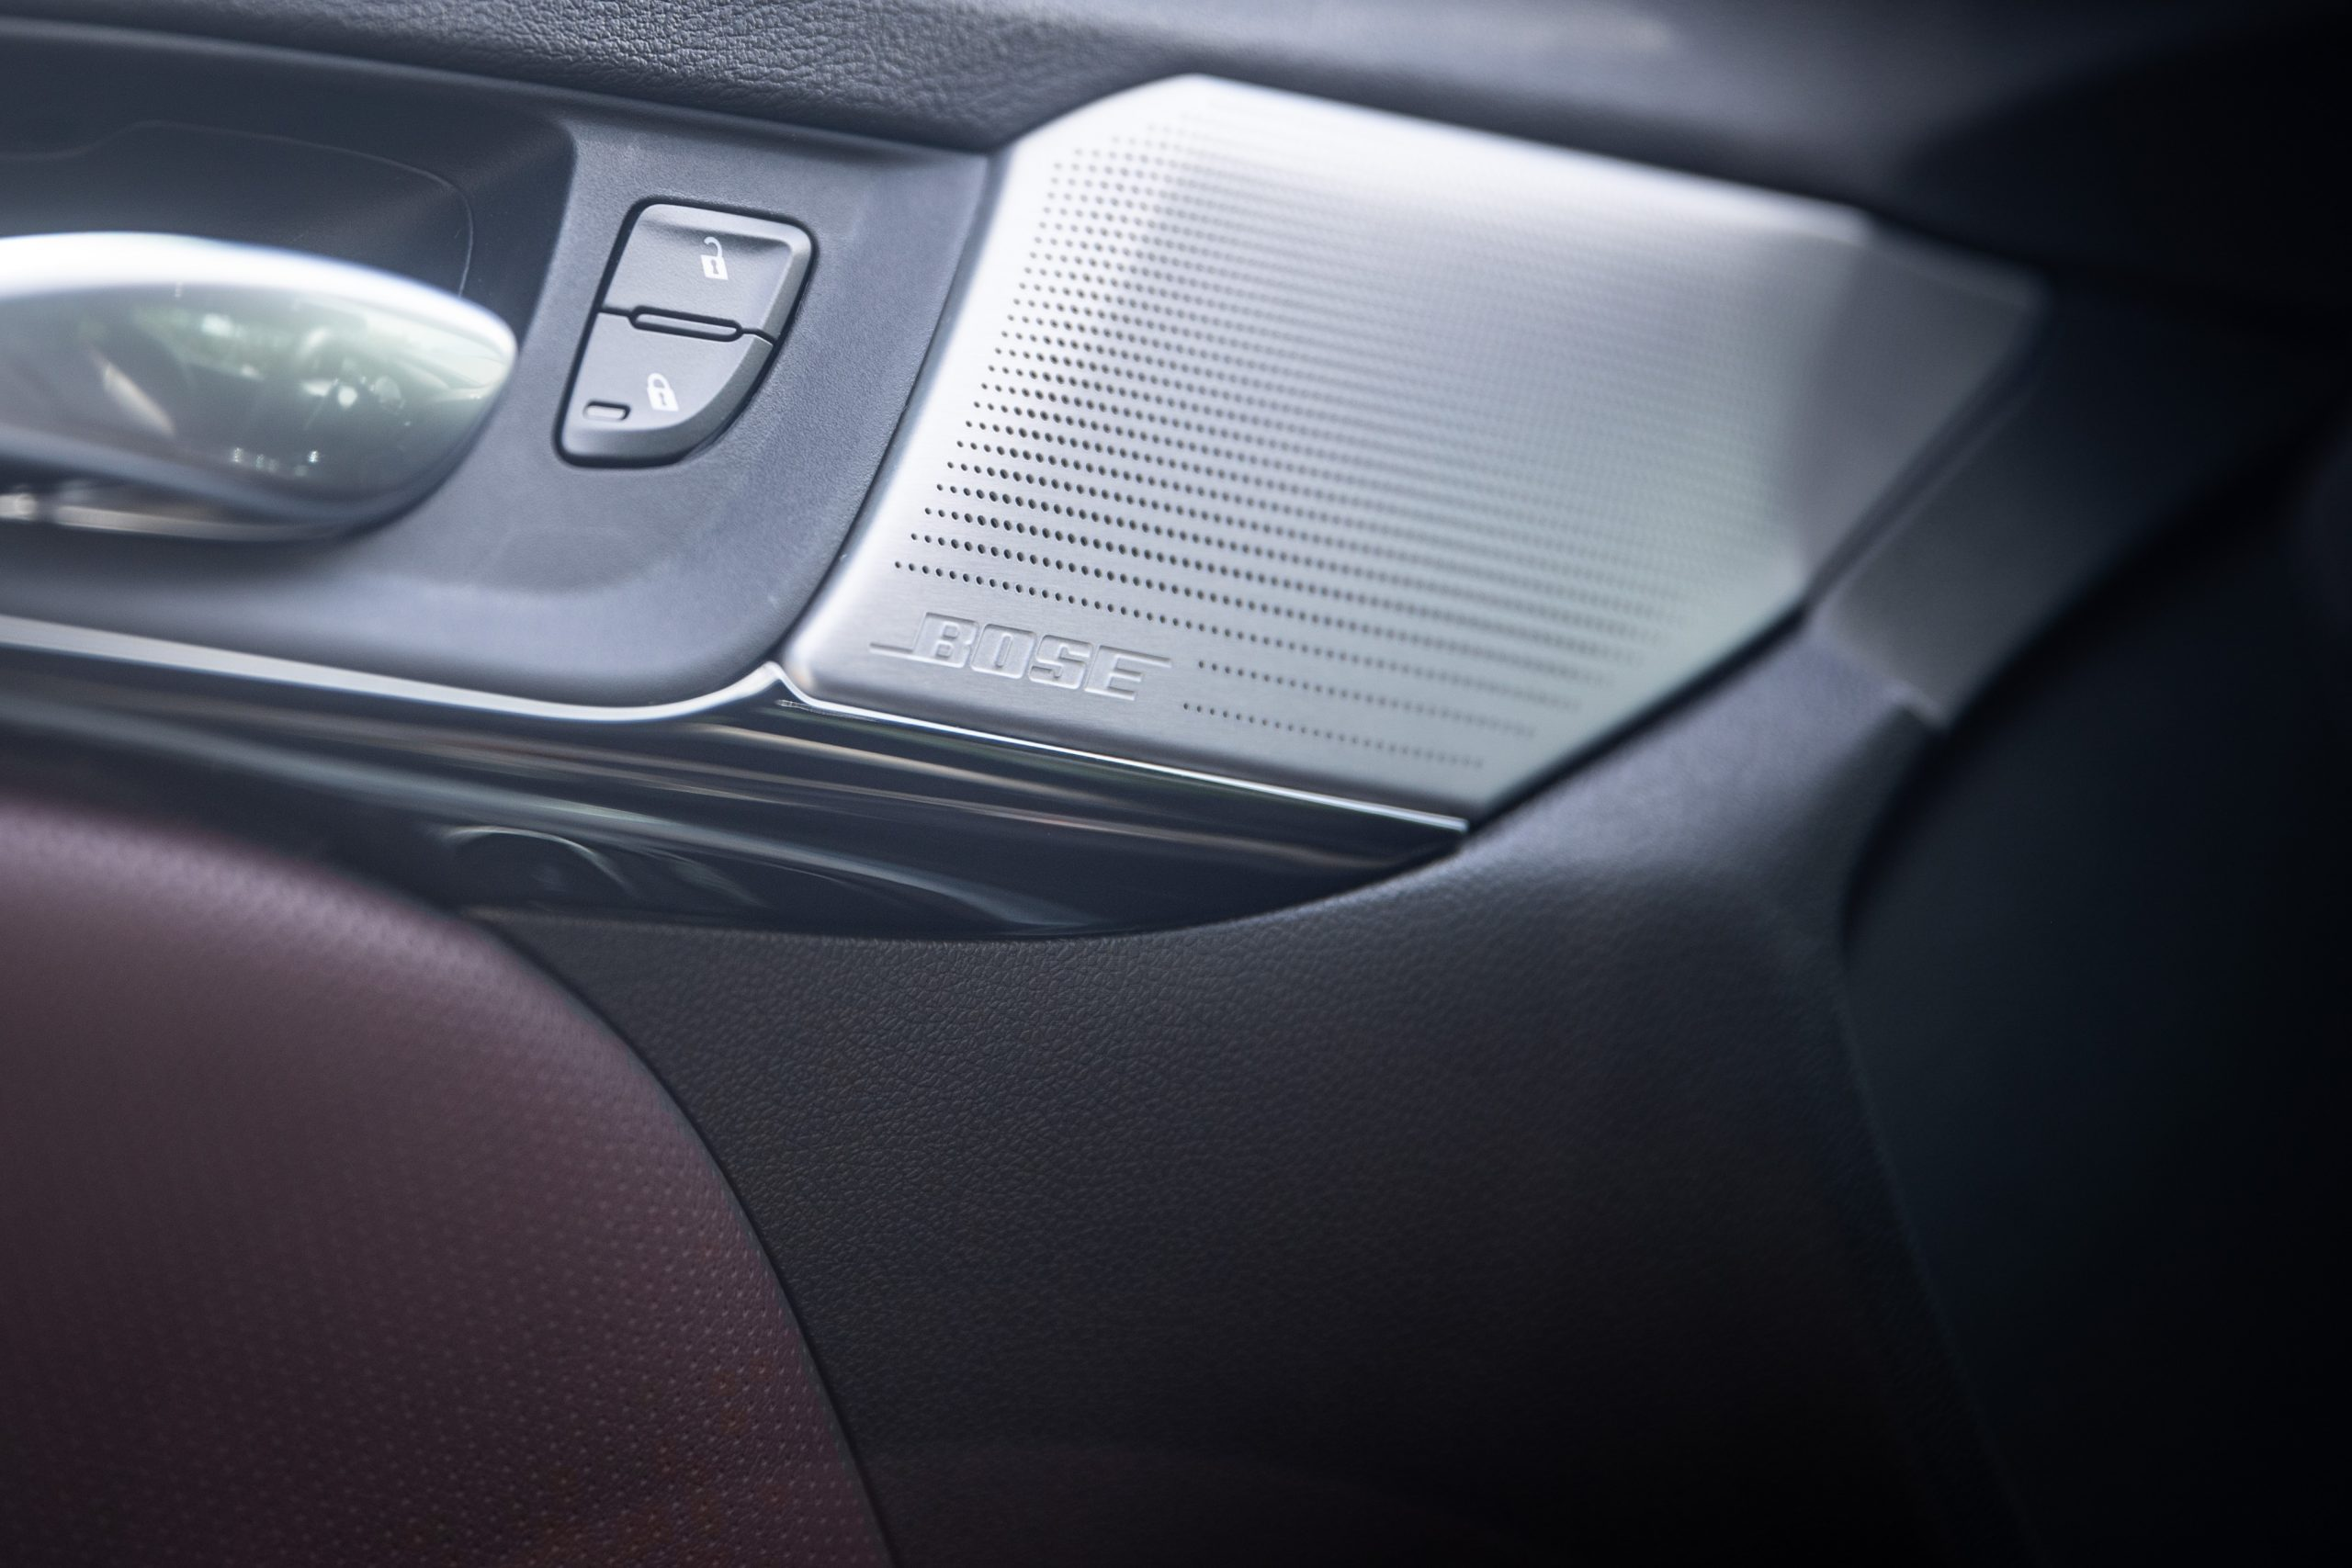 2020 Cadillac CT4-V 24 speaker